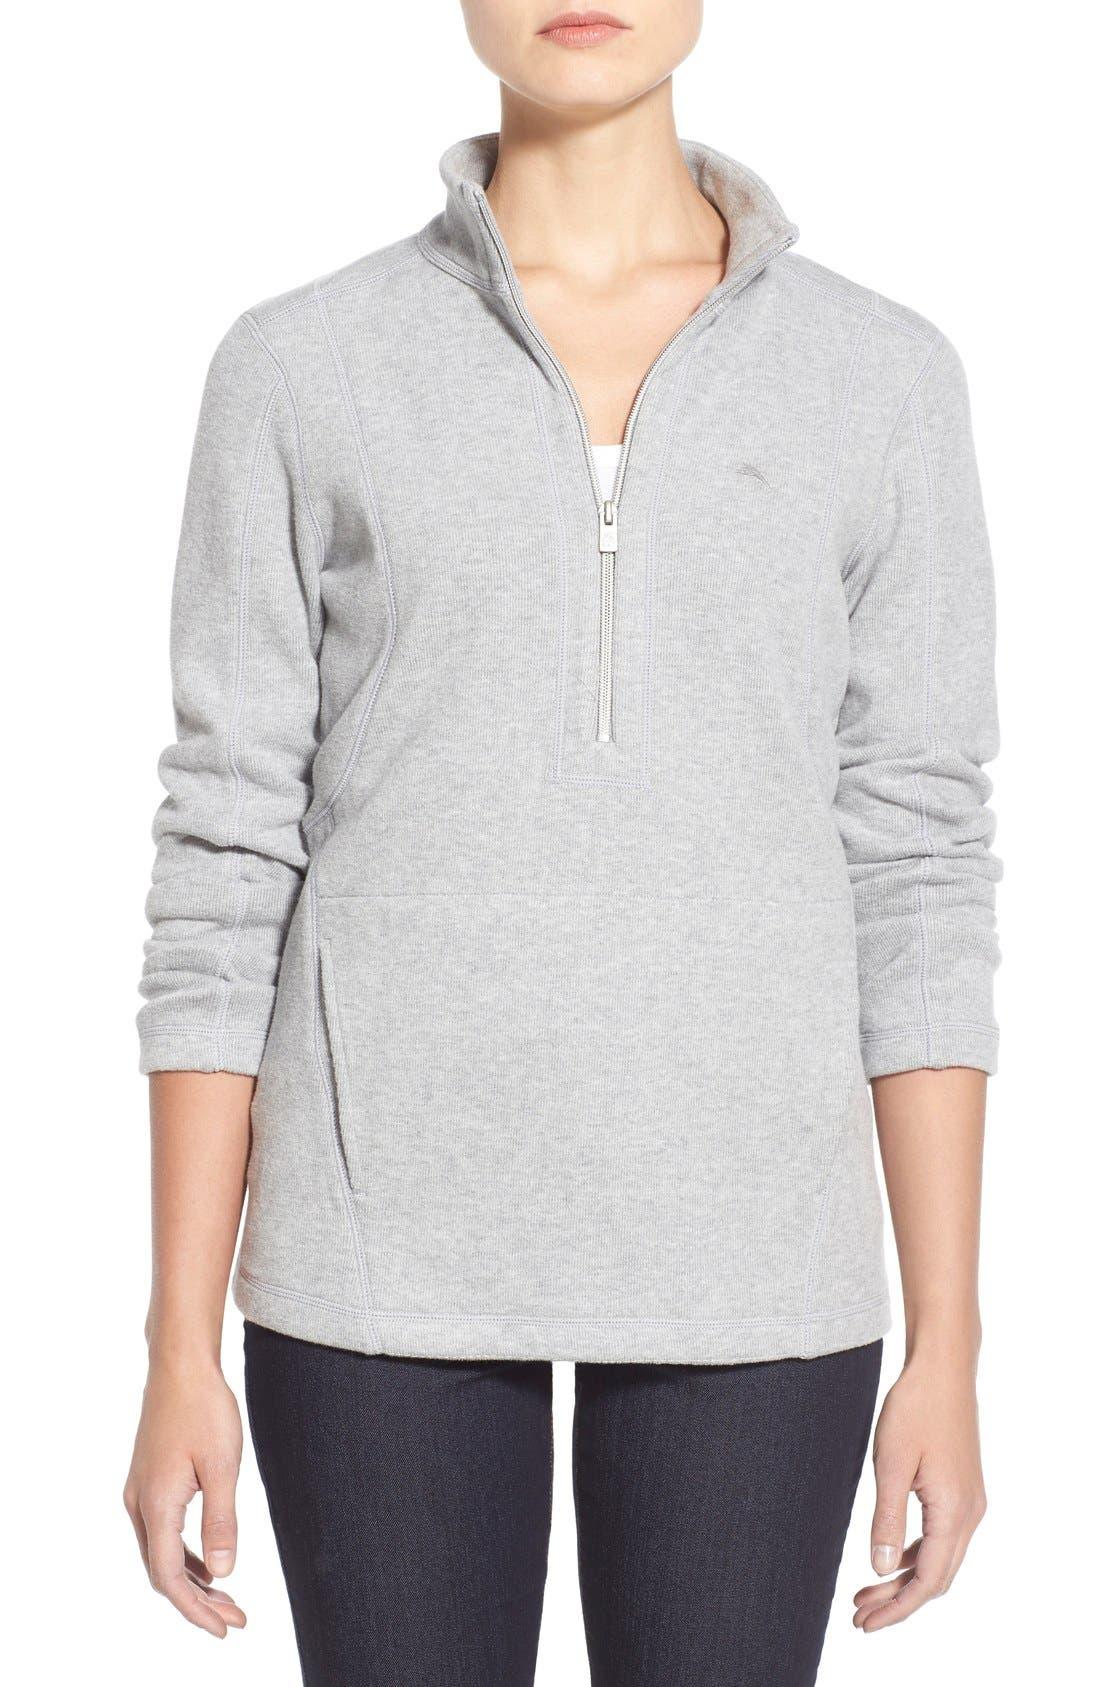 Tommy Bahama 'Aruba' Half Zip Sweatshirt